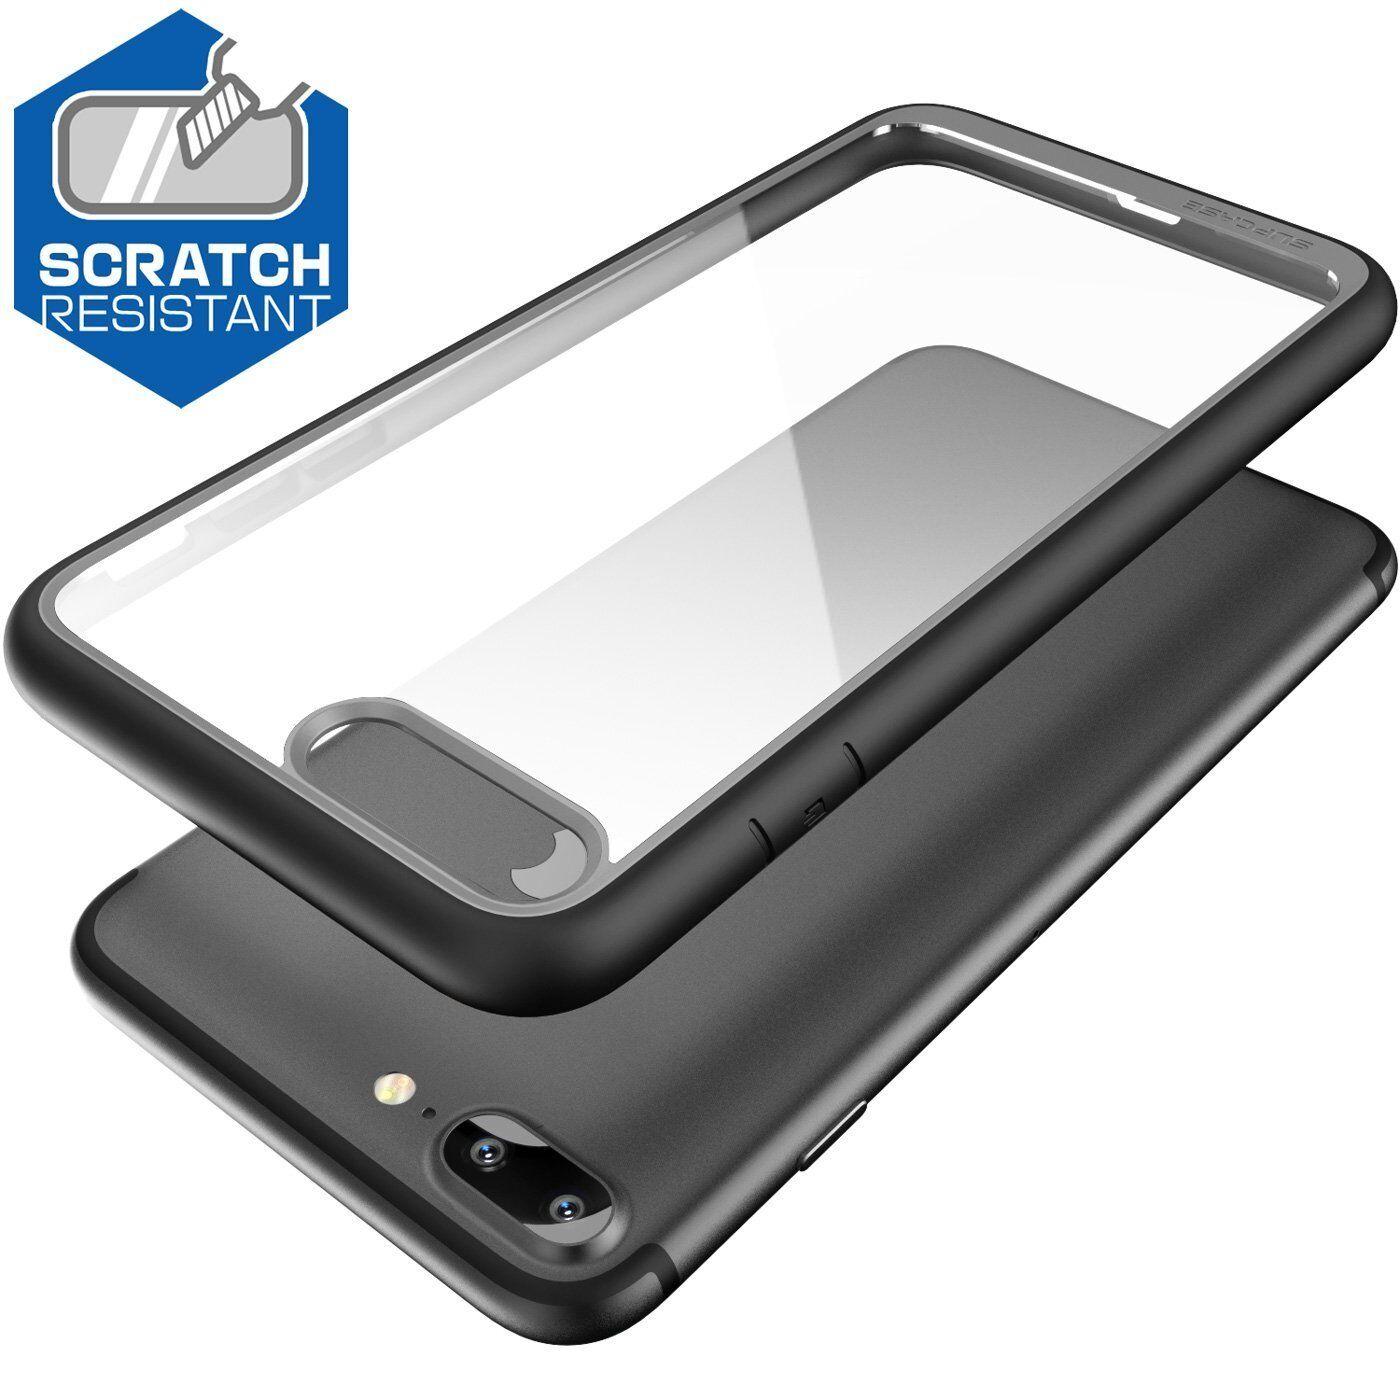 e6731927b25 iPhone 7 Plus and 8 Plus Case, SUPCASE Unicorn Beetle Style Protective Case